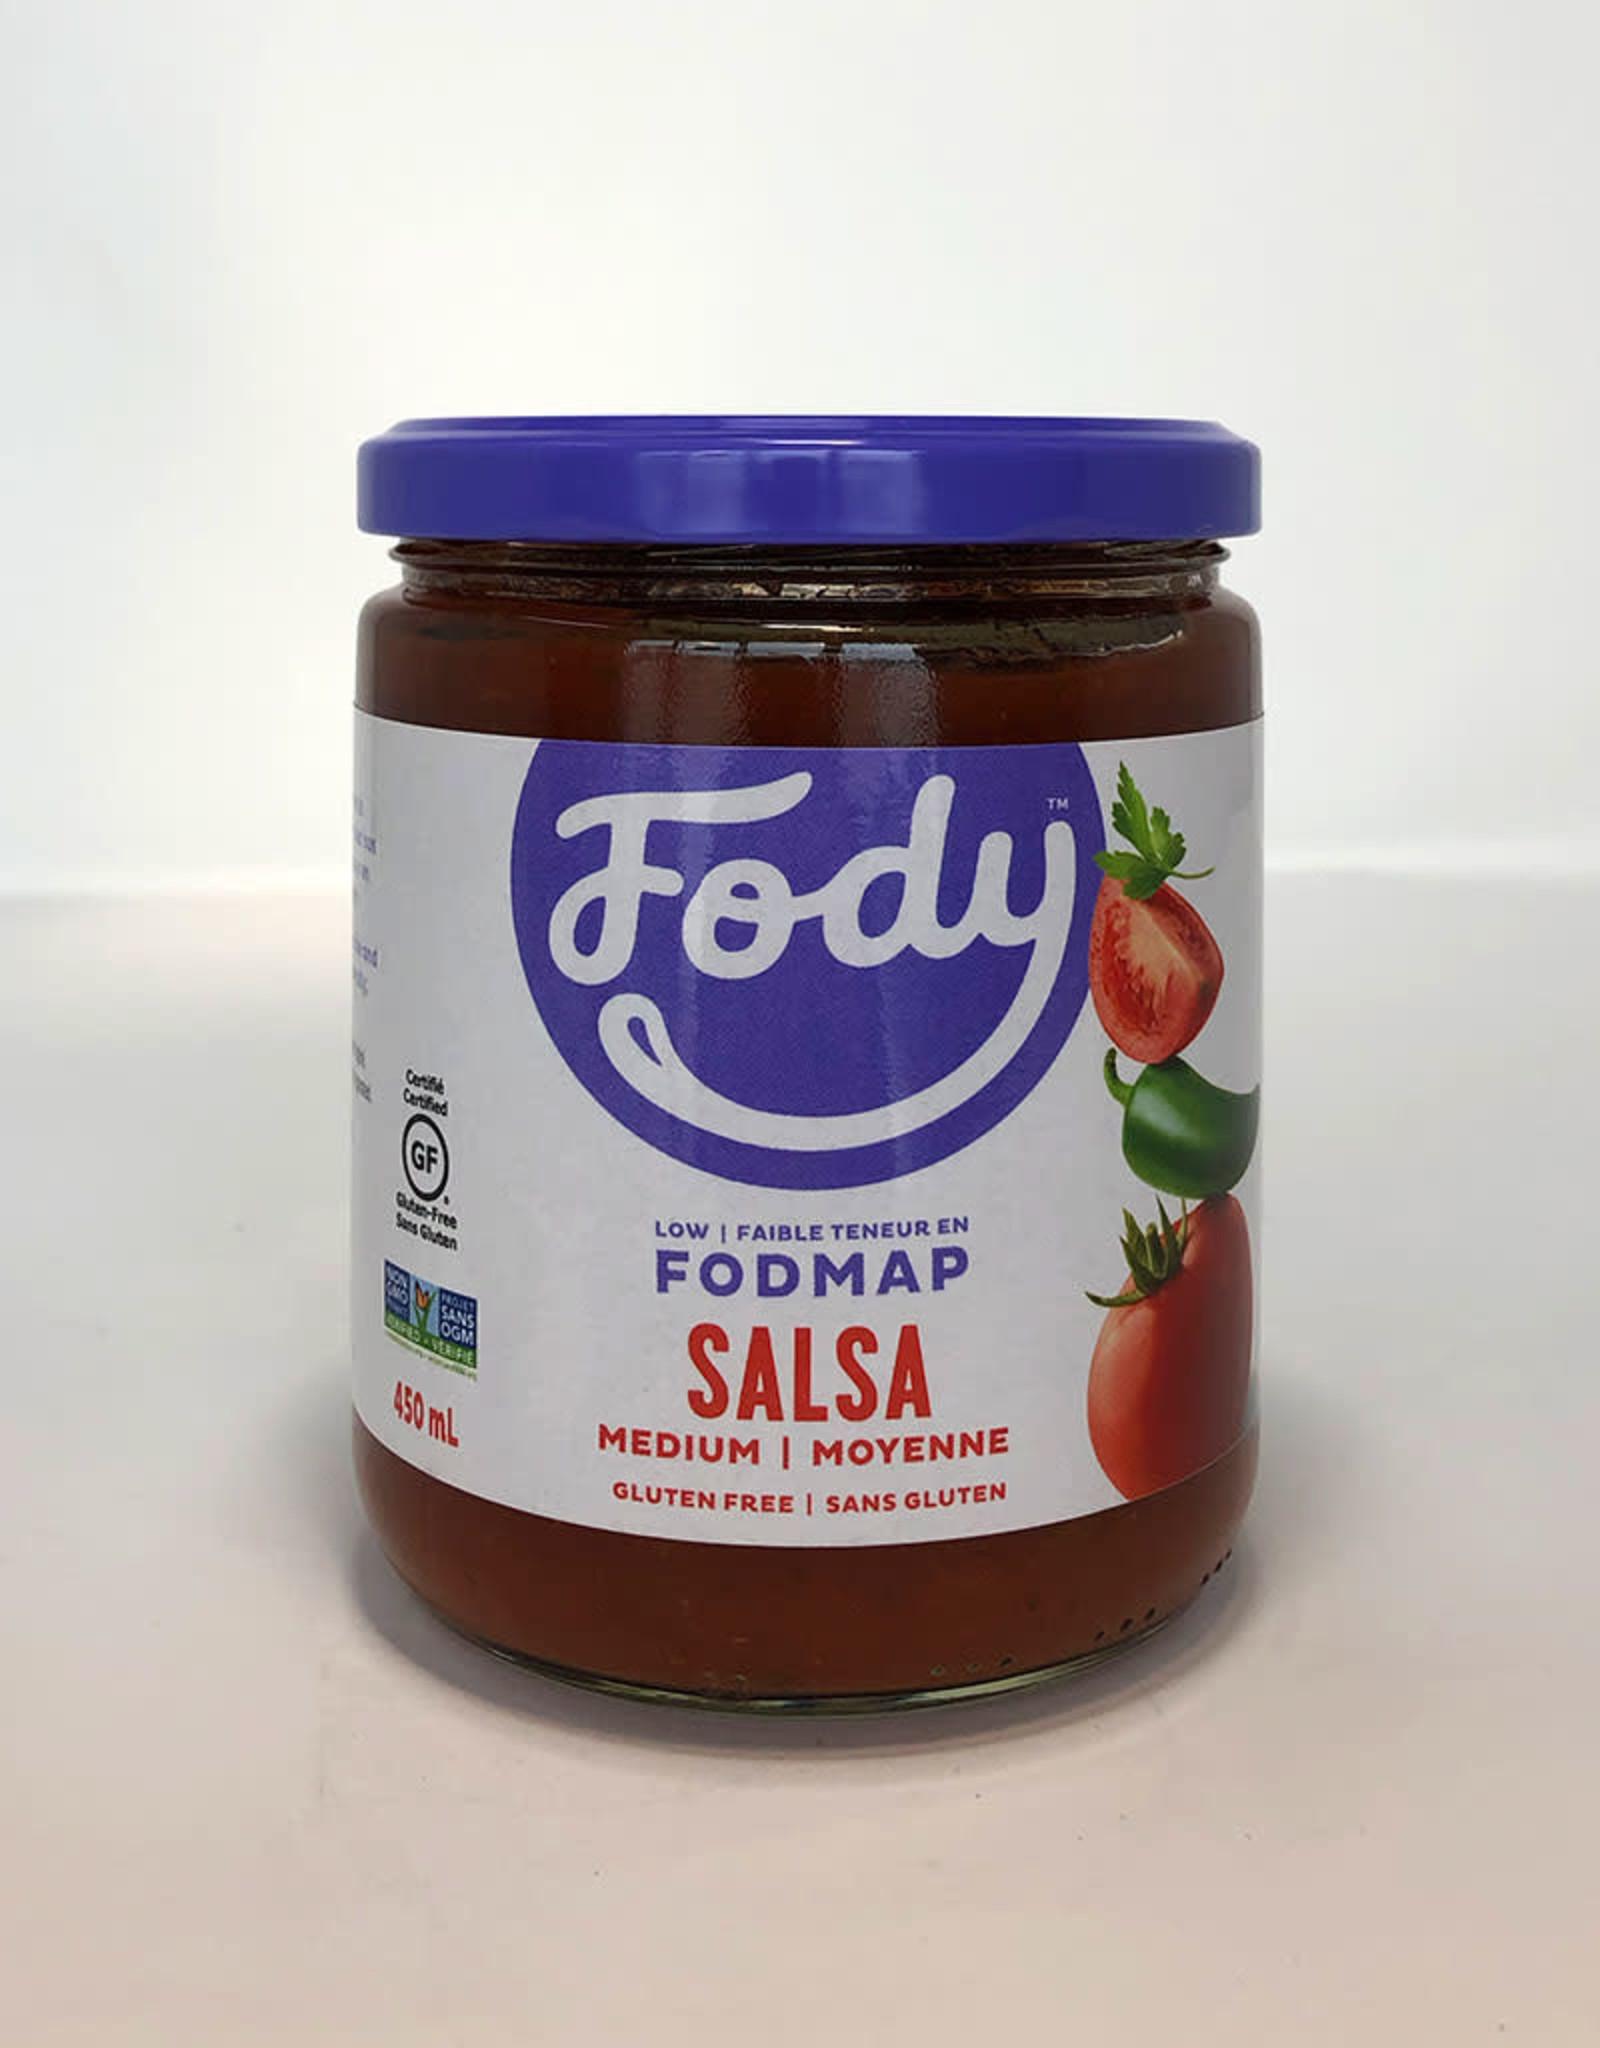 Fody Fody - Salsa, Medium